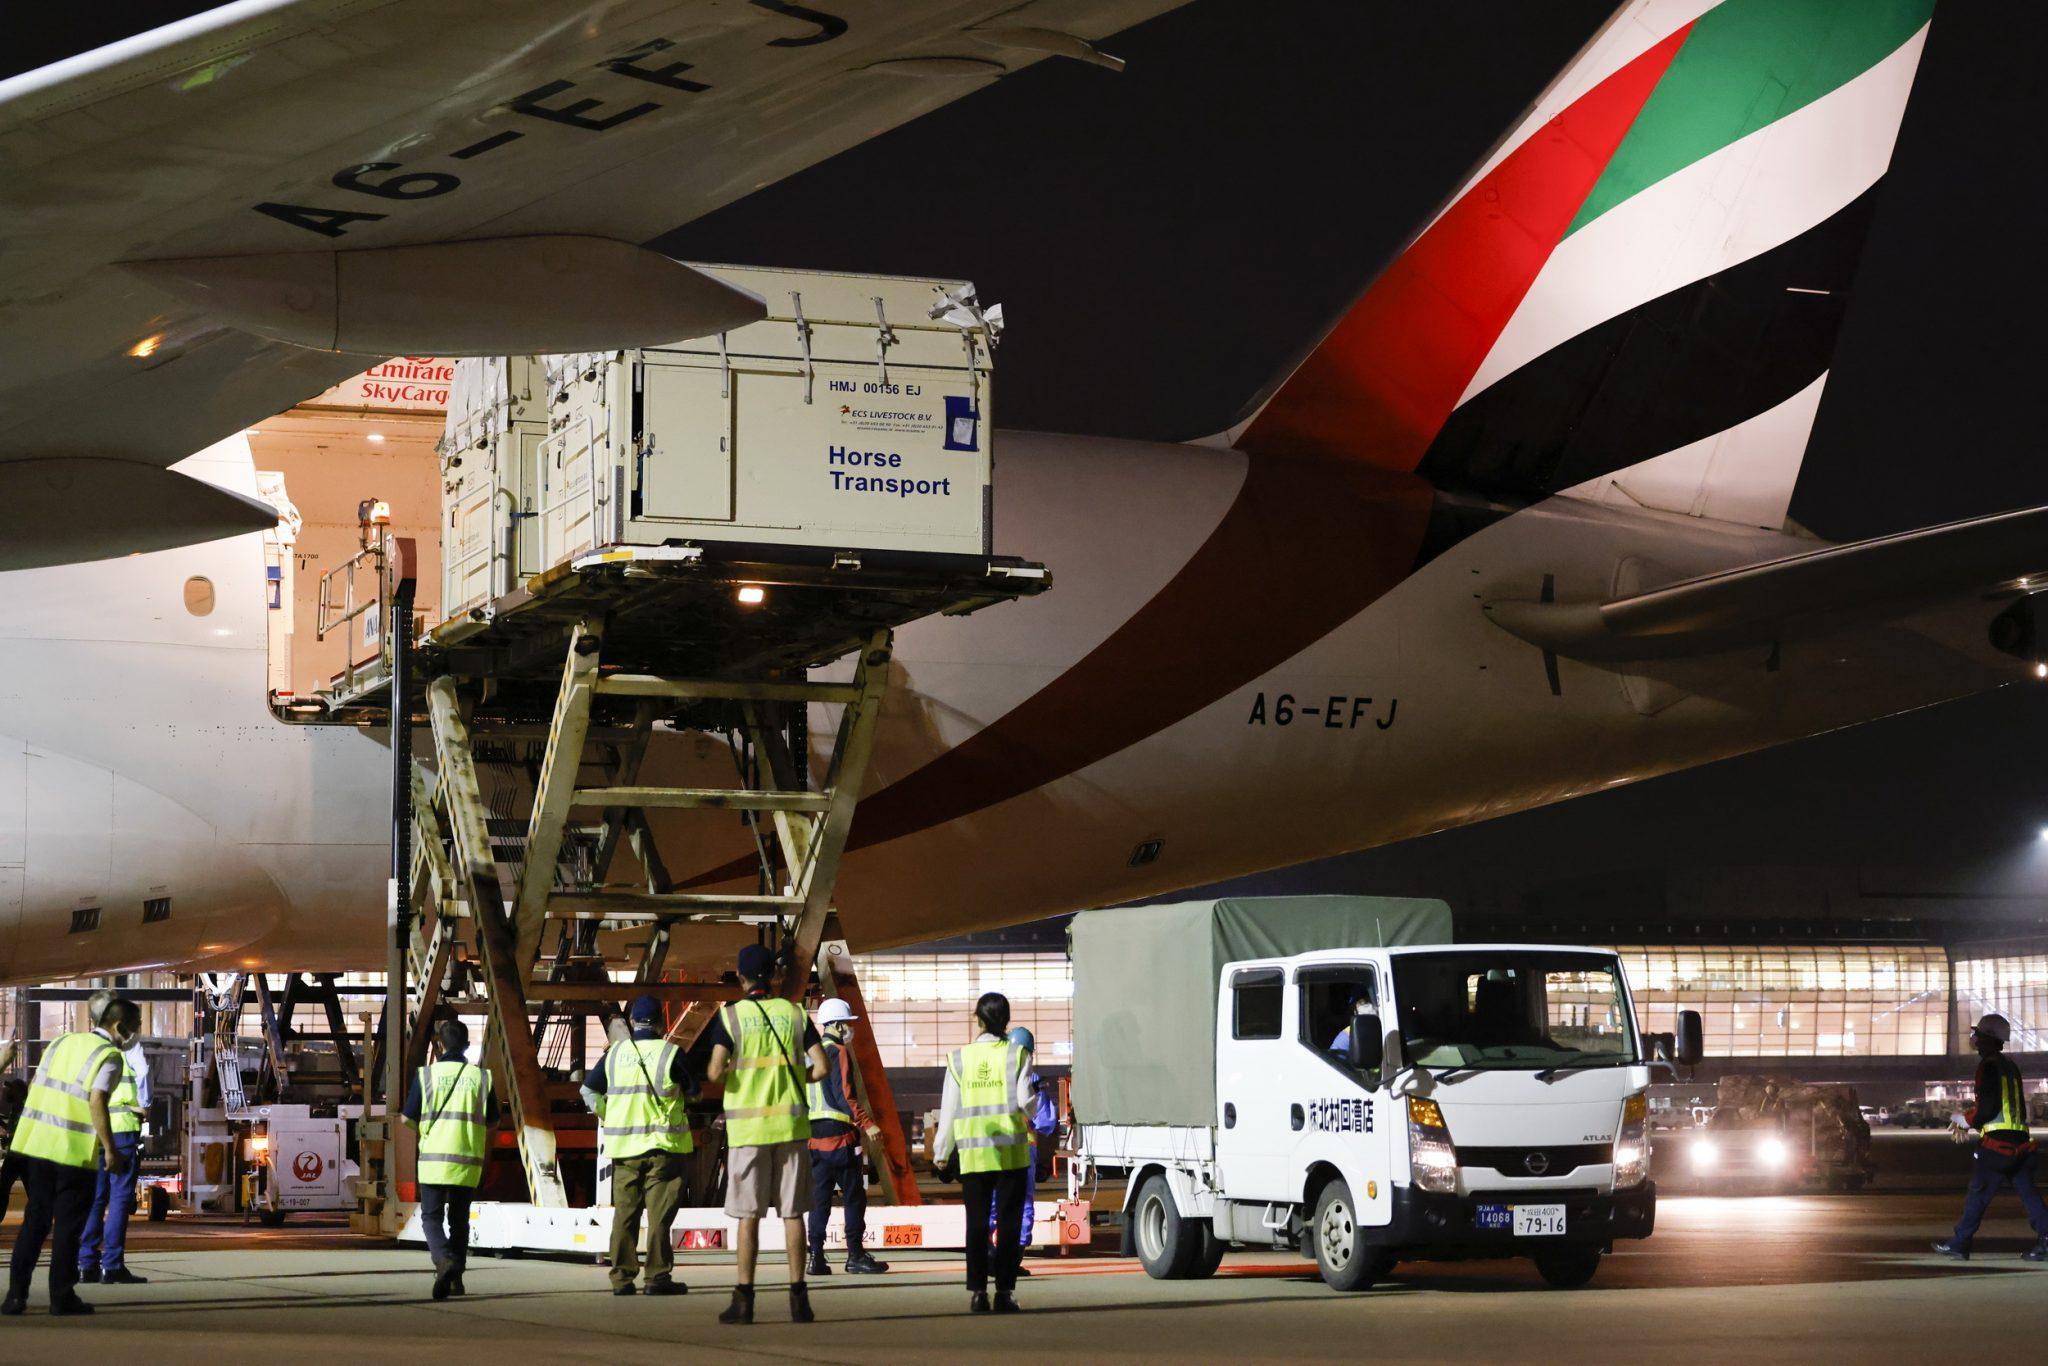 Emirates flies Olympic horses